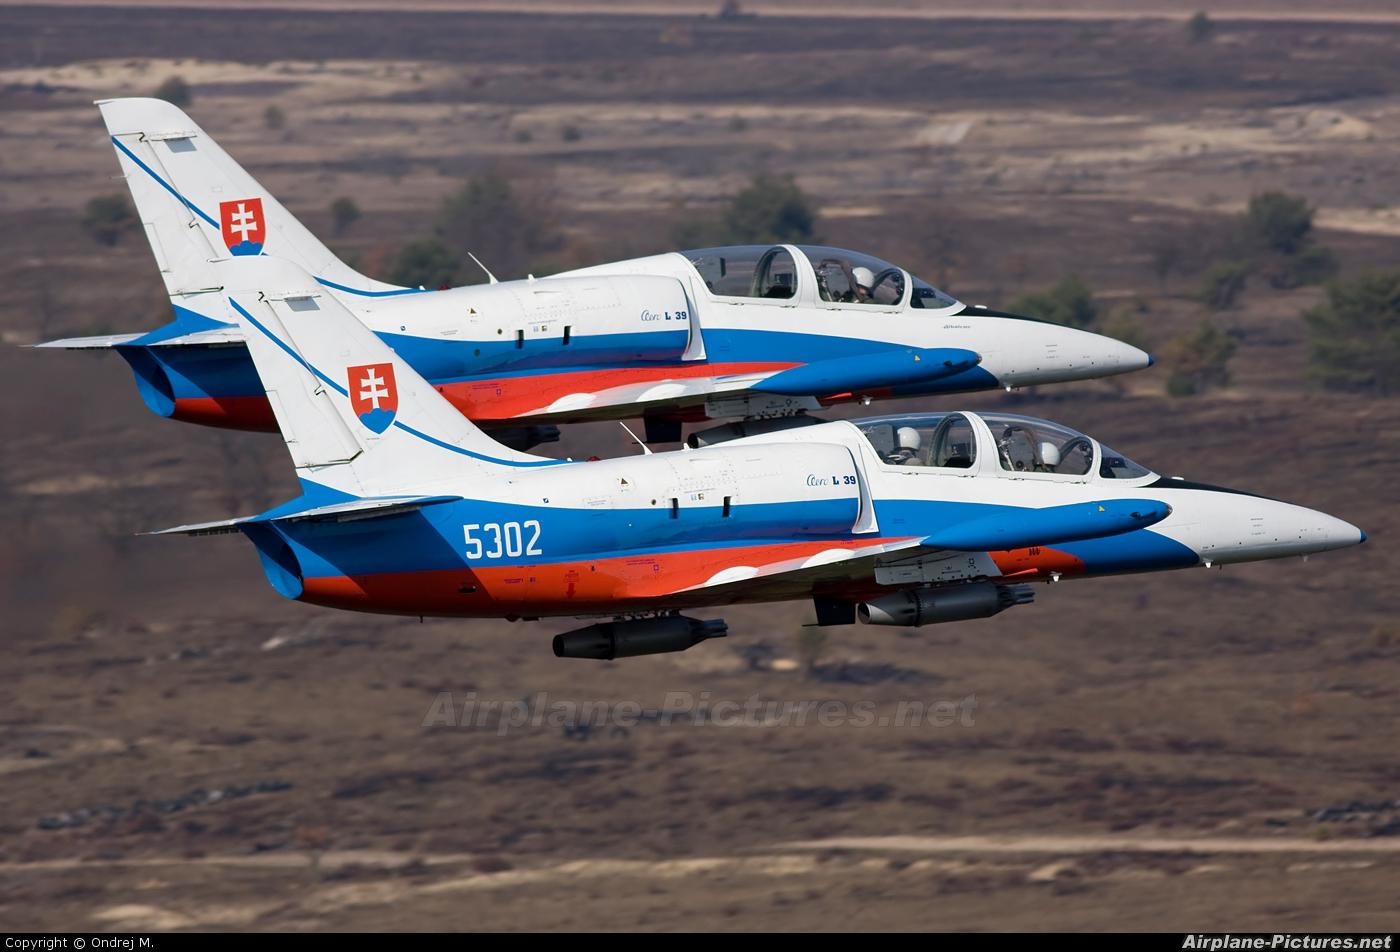 Slovakia -  Air Force 5302 aircraft at In Flight - Slovakia